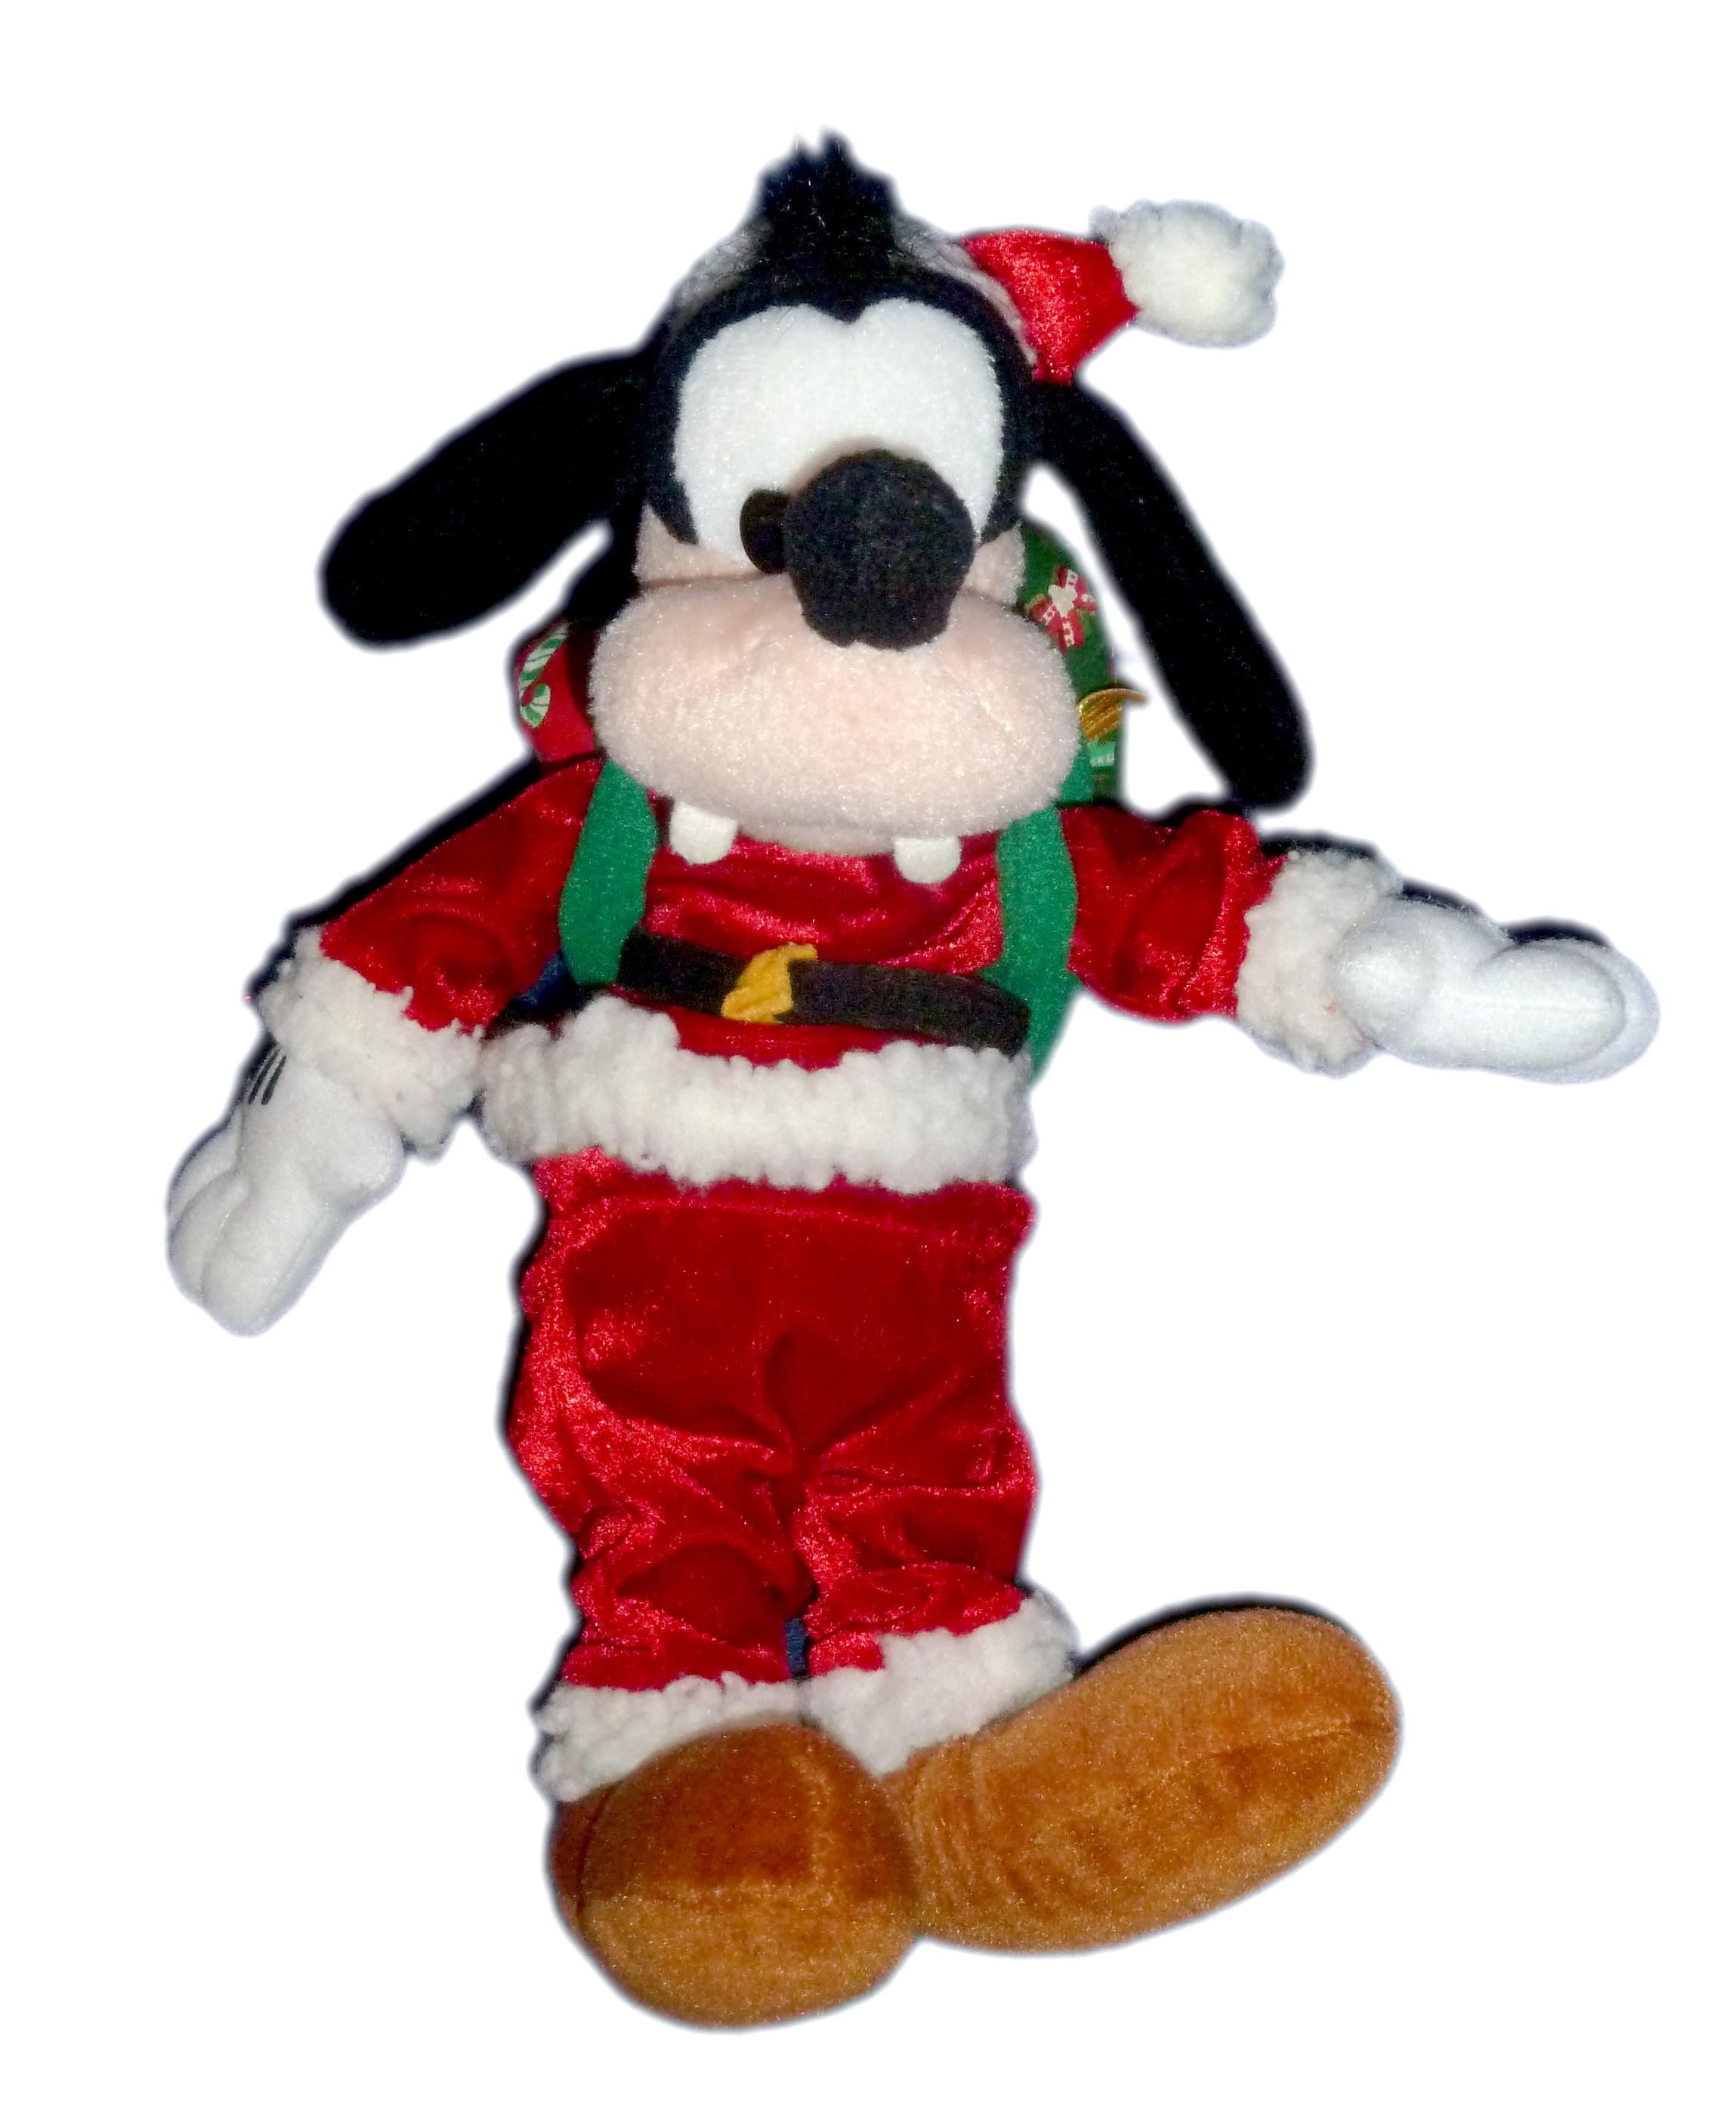 Peluche Dingo Deguise Pere Noel Cadeaux H 25 Cm Disney Disneyland